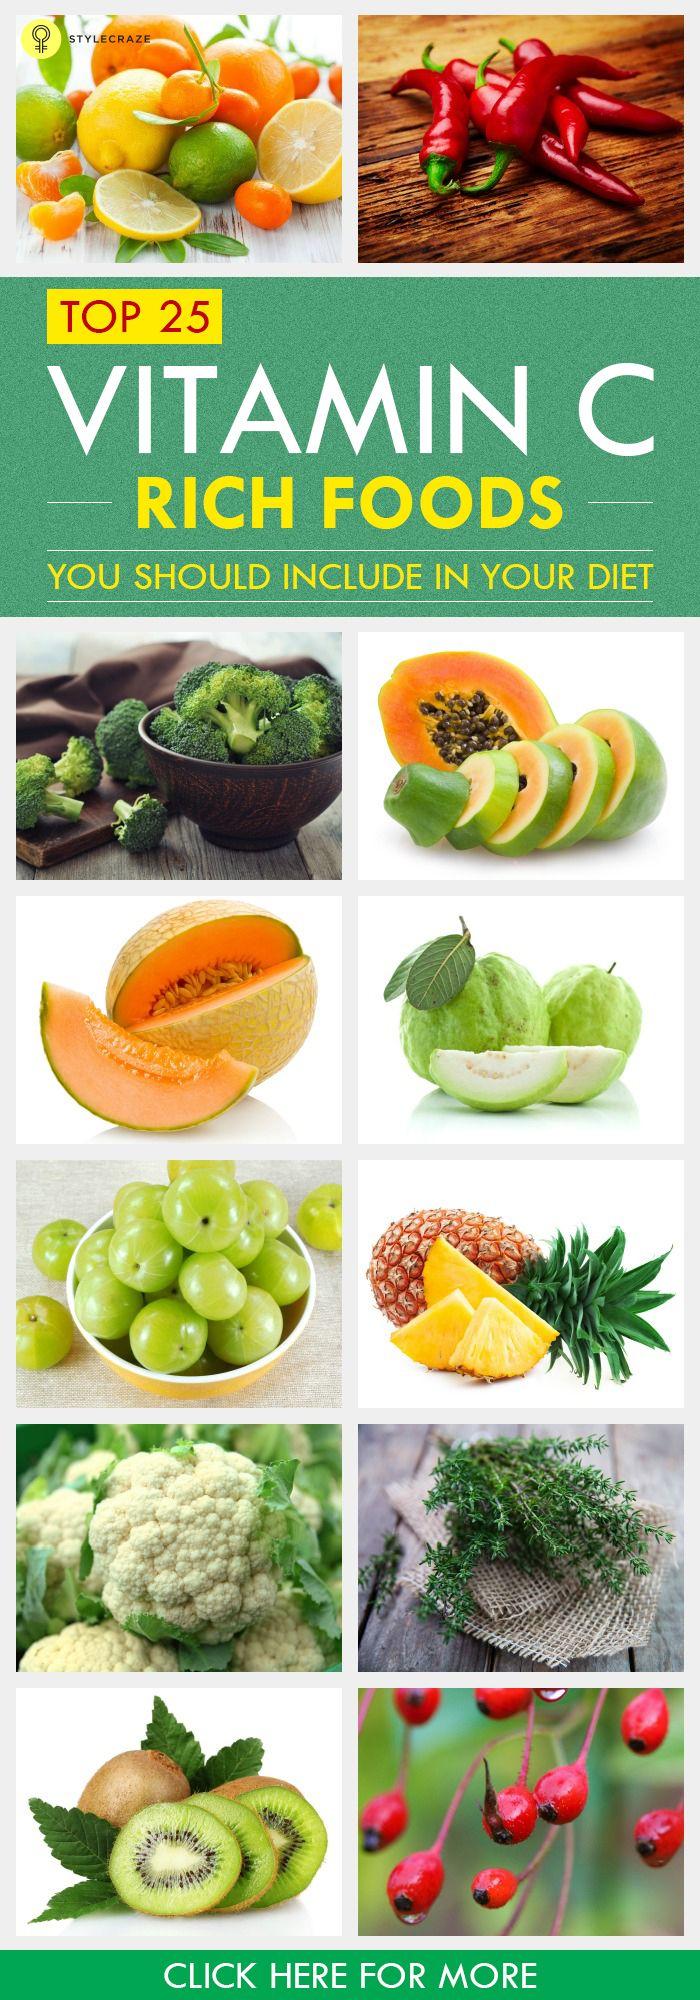 Watch Top 25 Vitamin A Rich Foods video